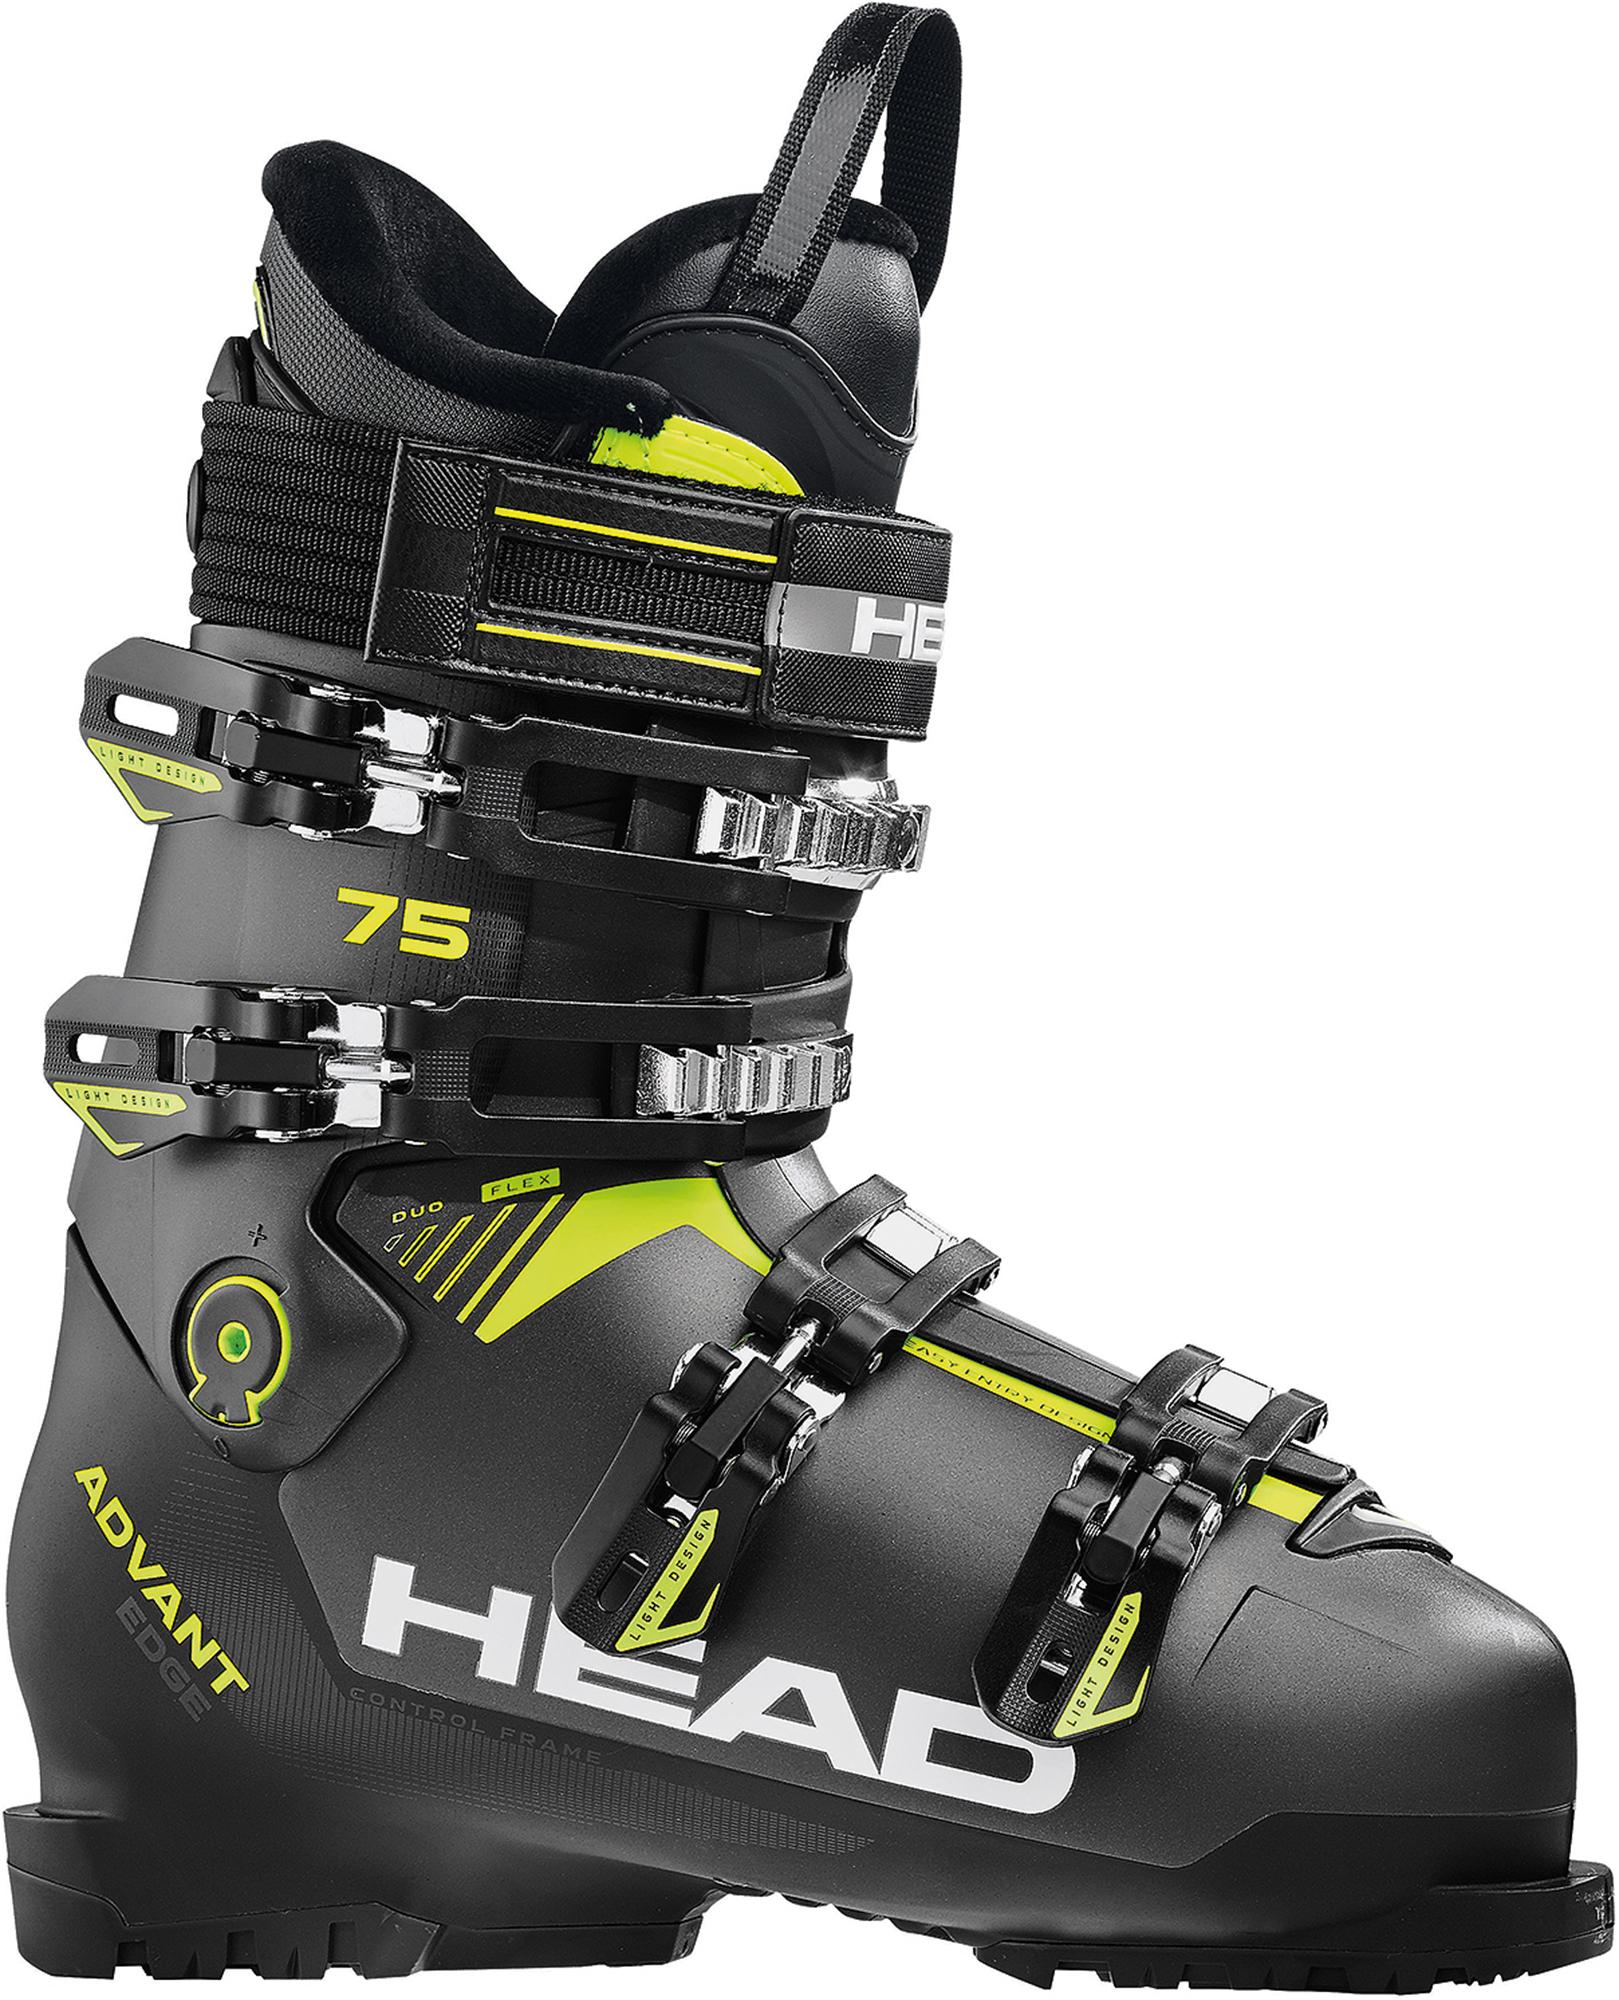 Head Ботинки горнолыжные Head Advant Edge 75, размер 45